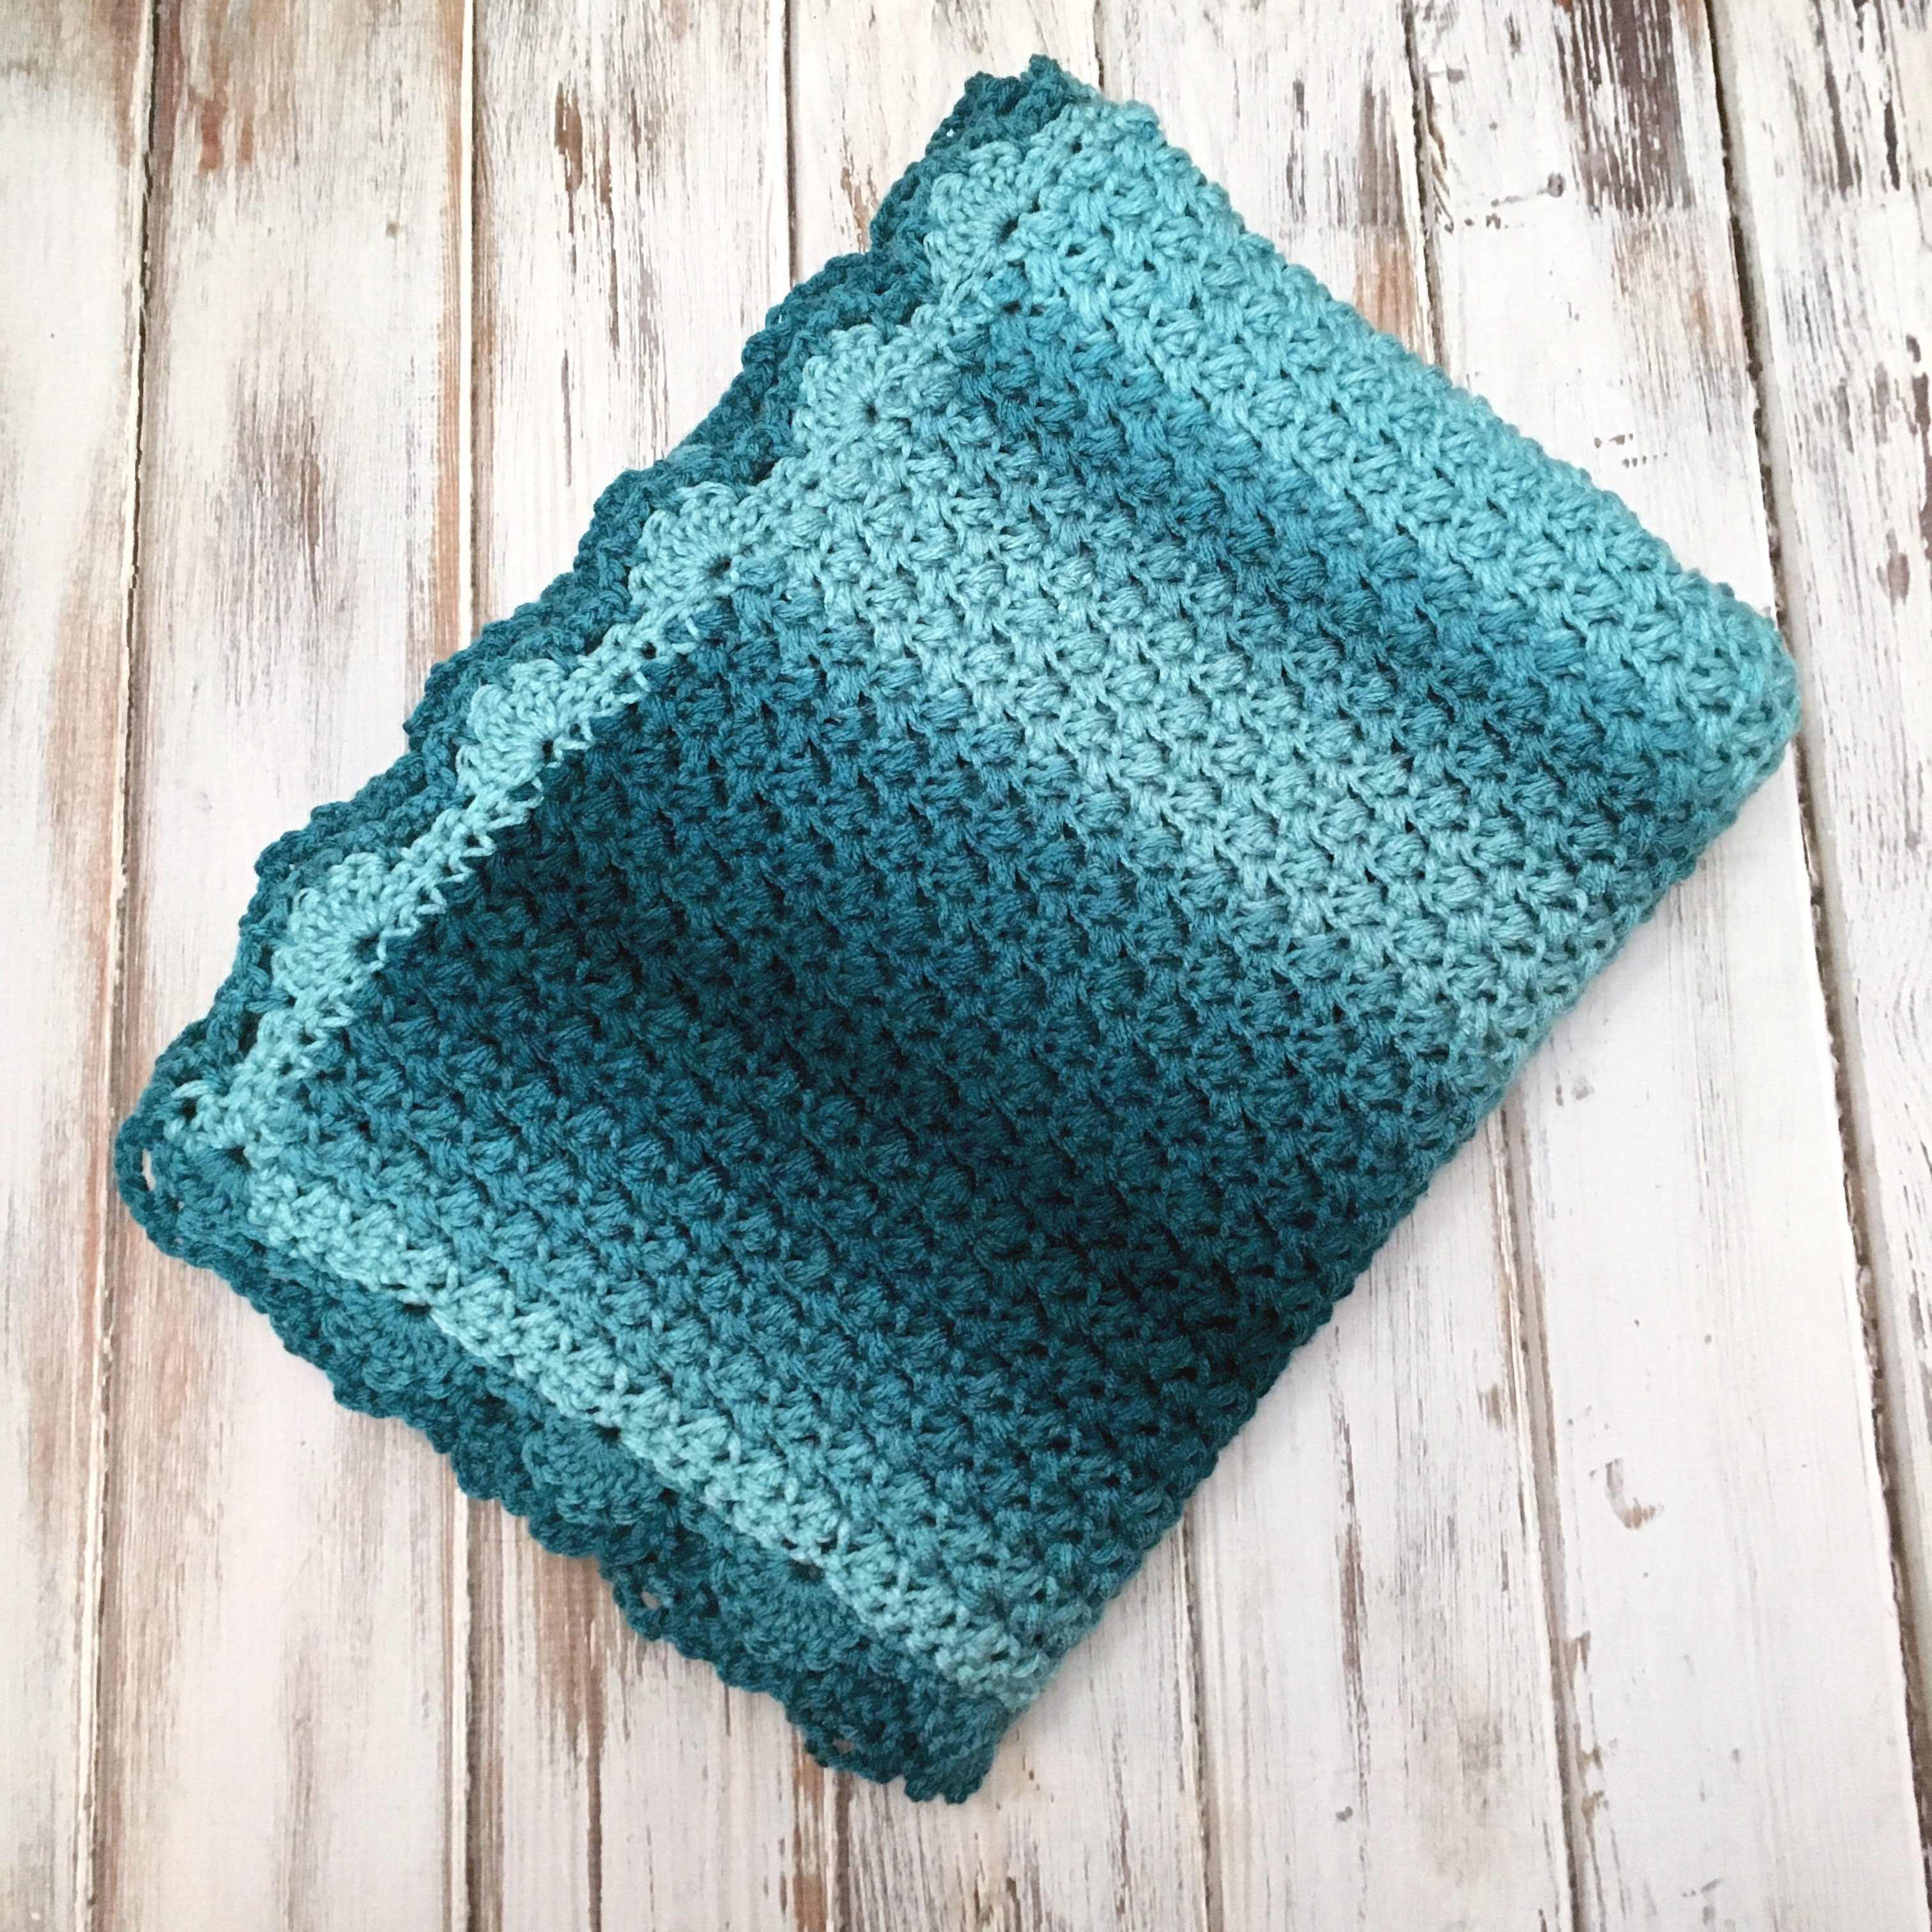 Elegant Ombre Baby Blanket - Free Crochet Pattern - love  life  yarn